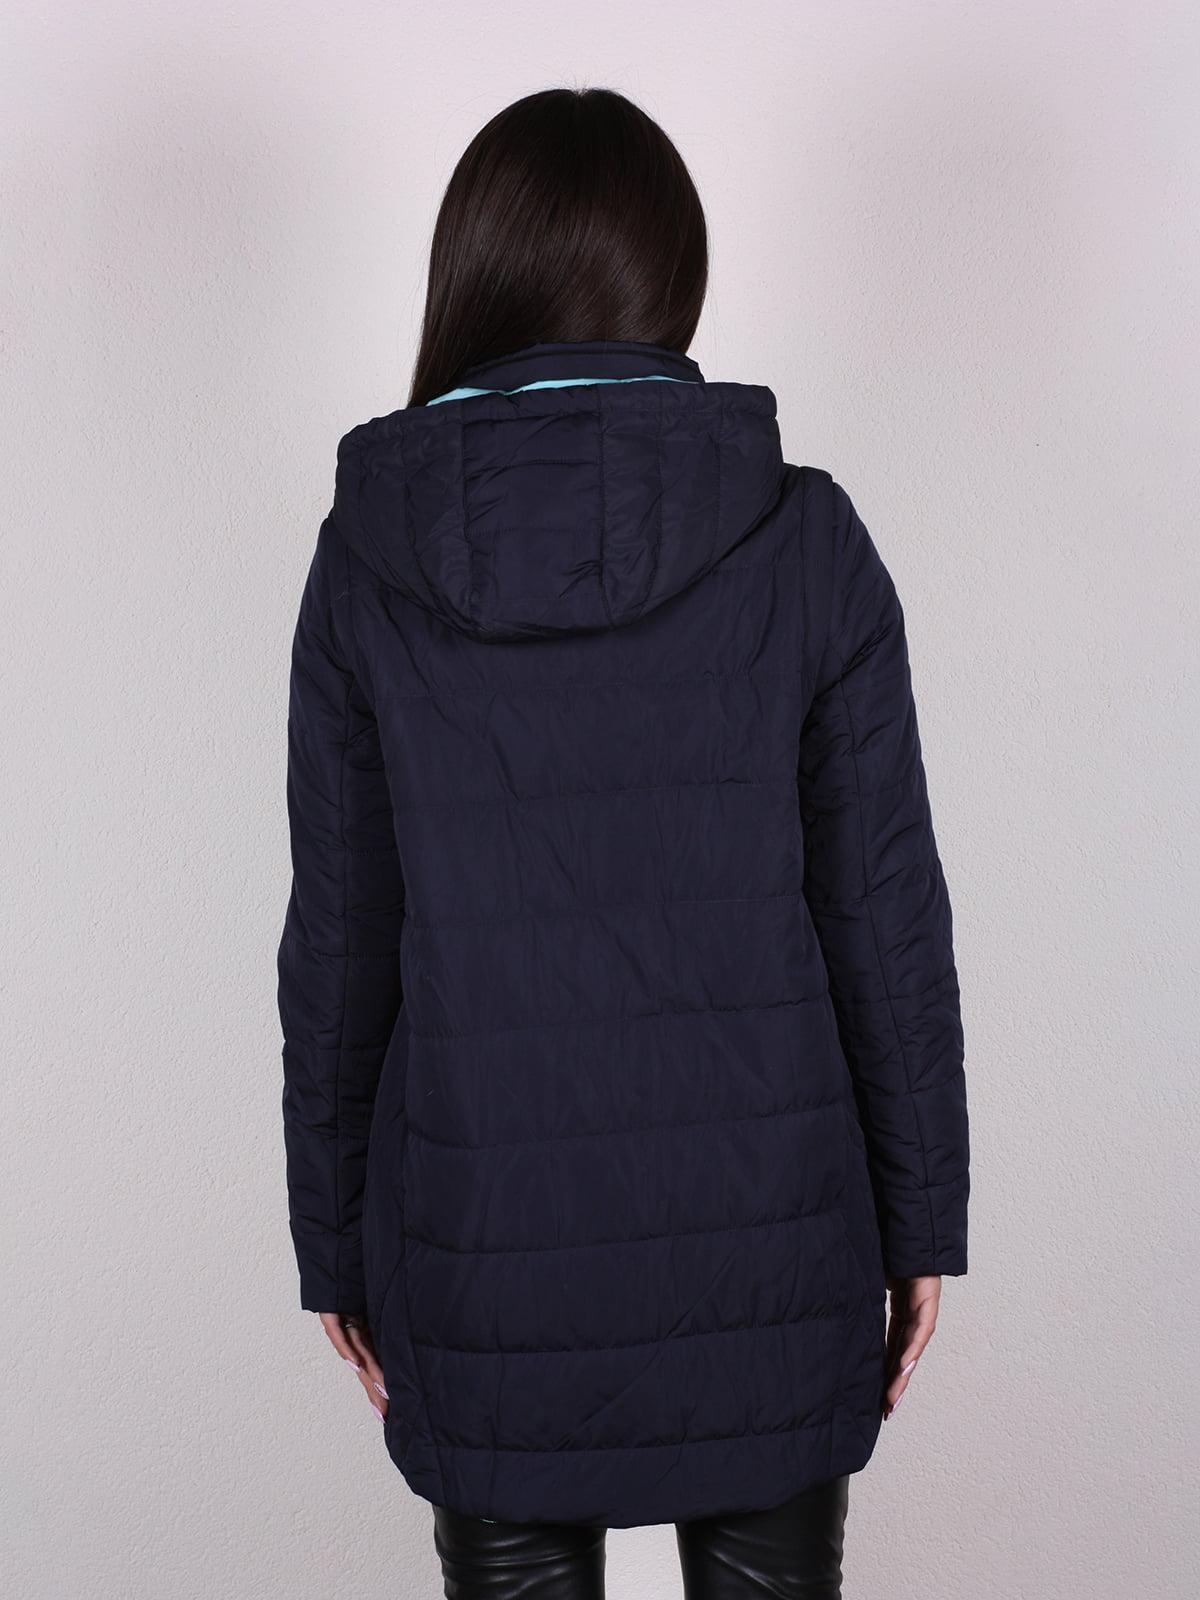 Куртка темно-синяя   4922471   фото 4